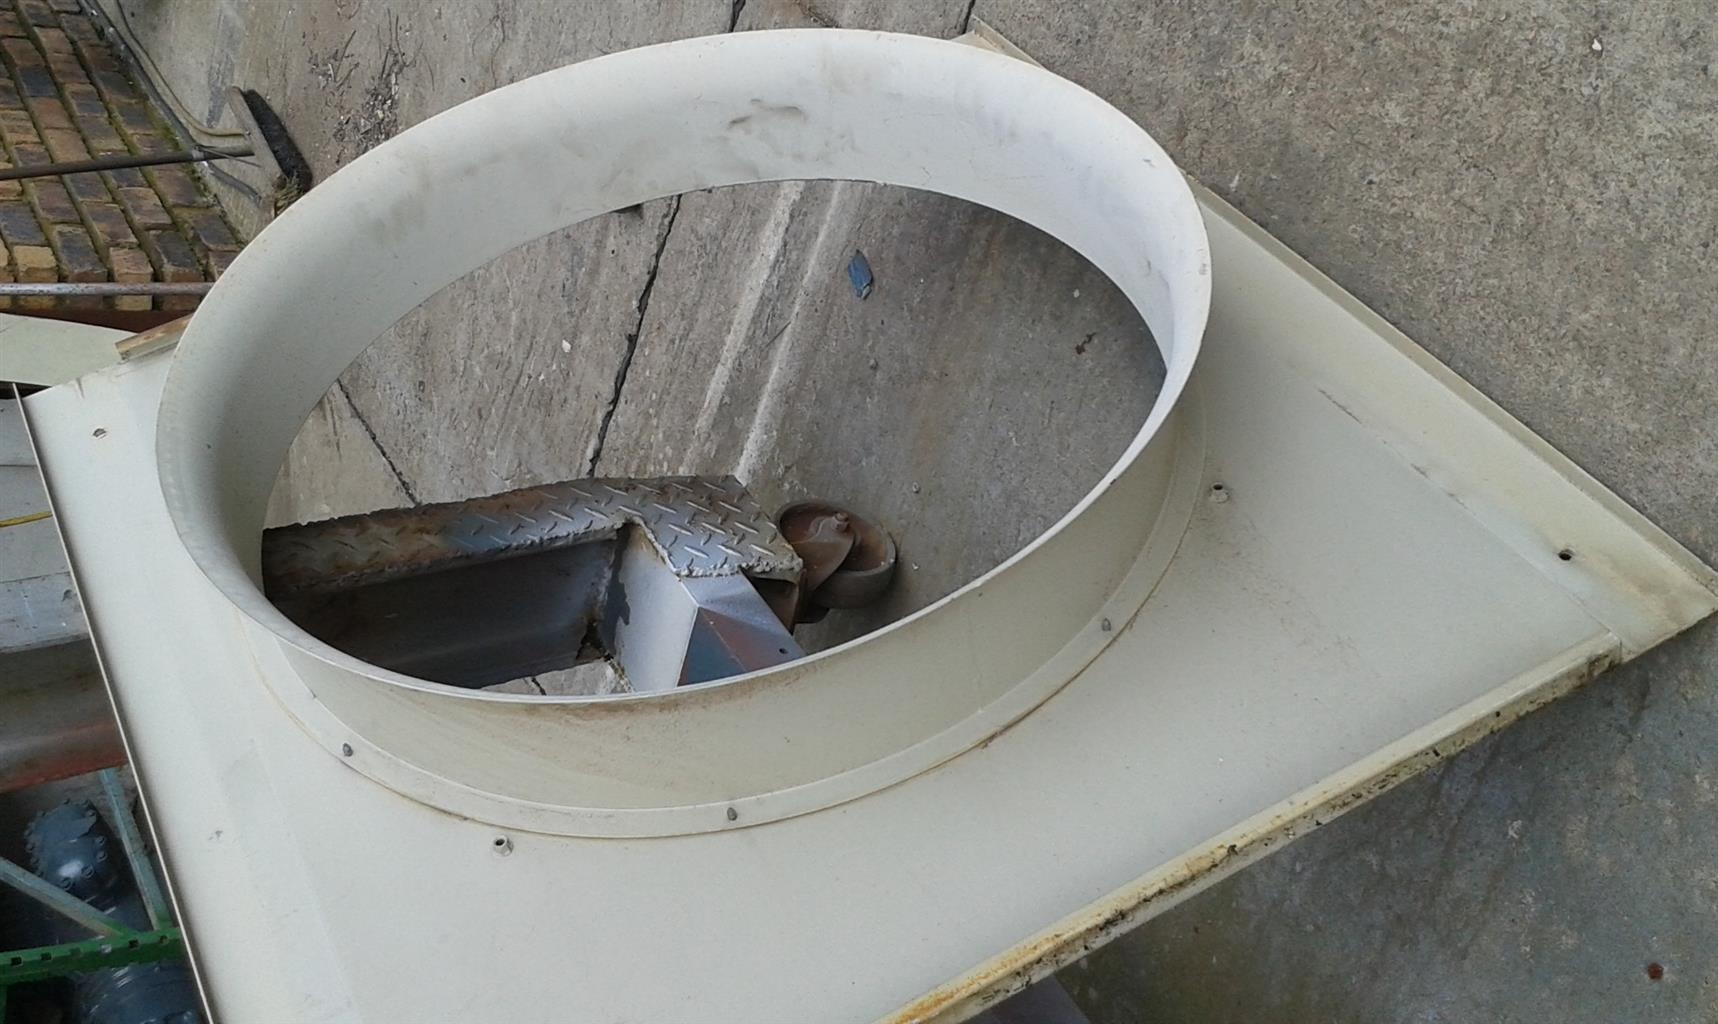 Ziehl high velocity fans